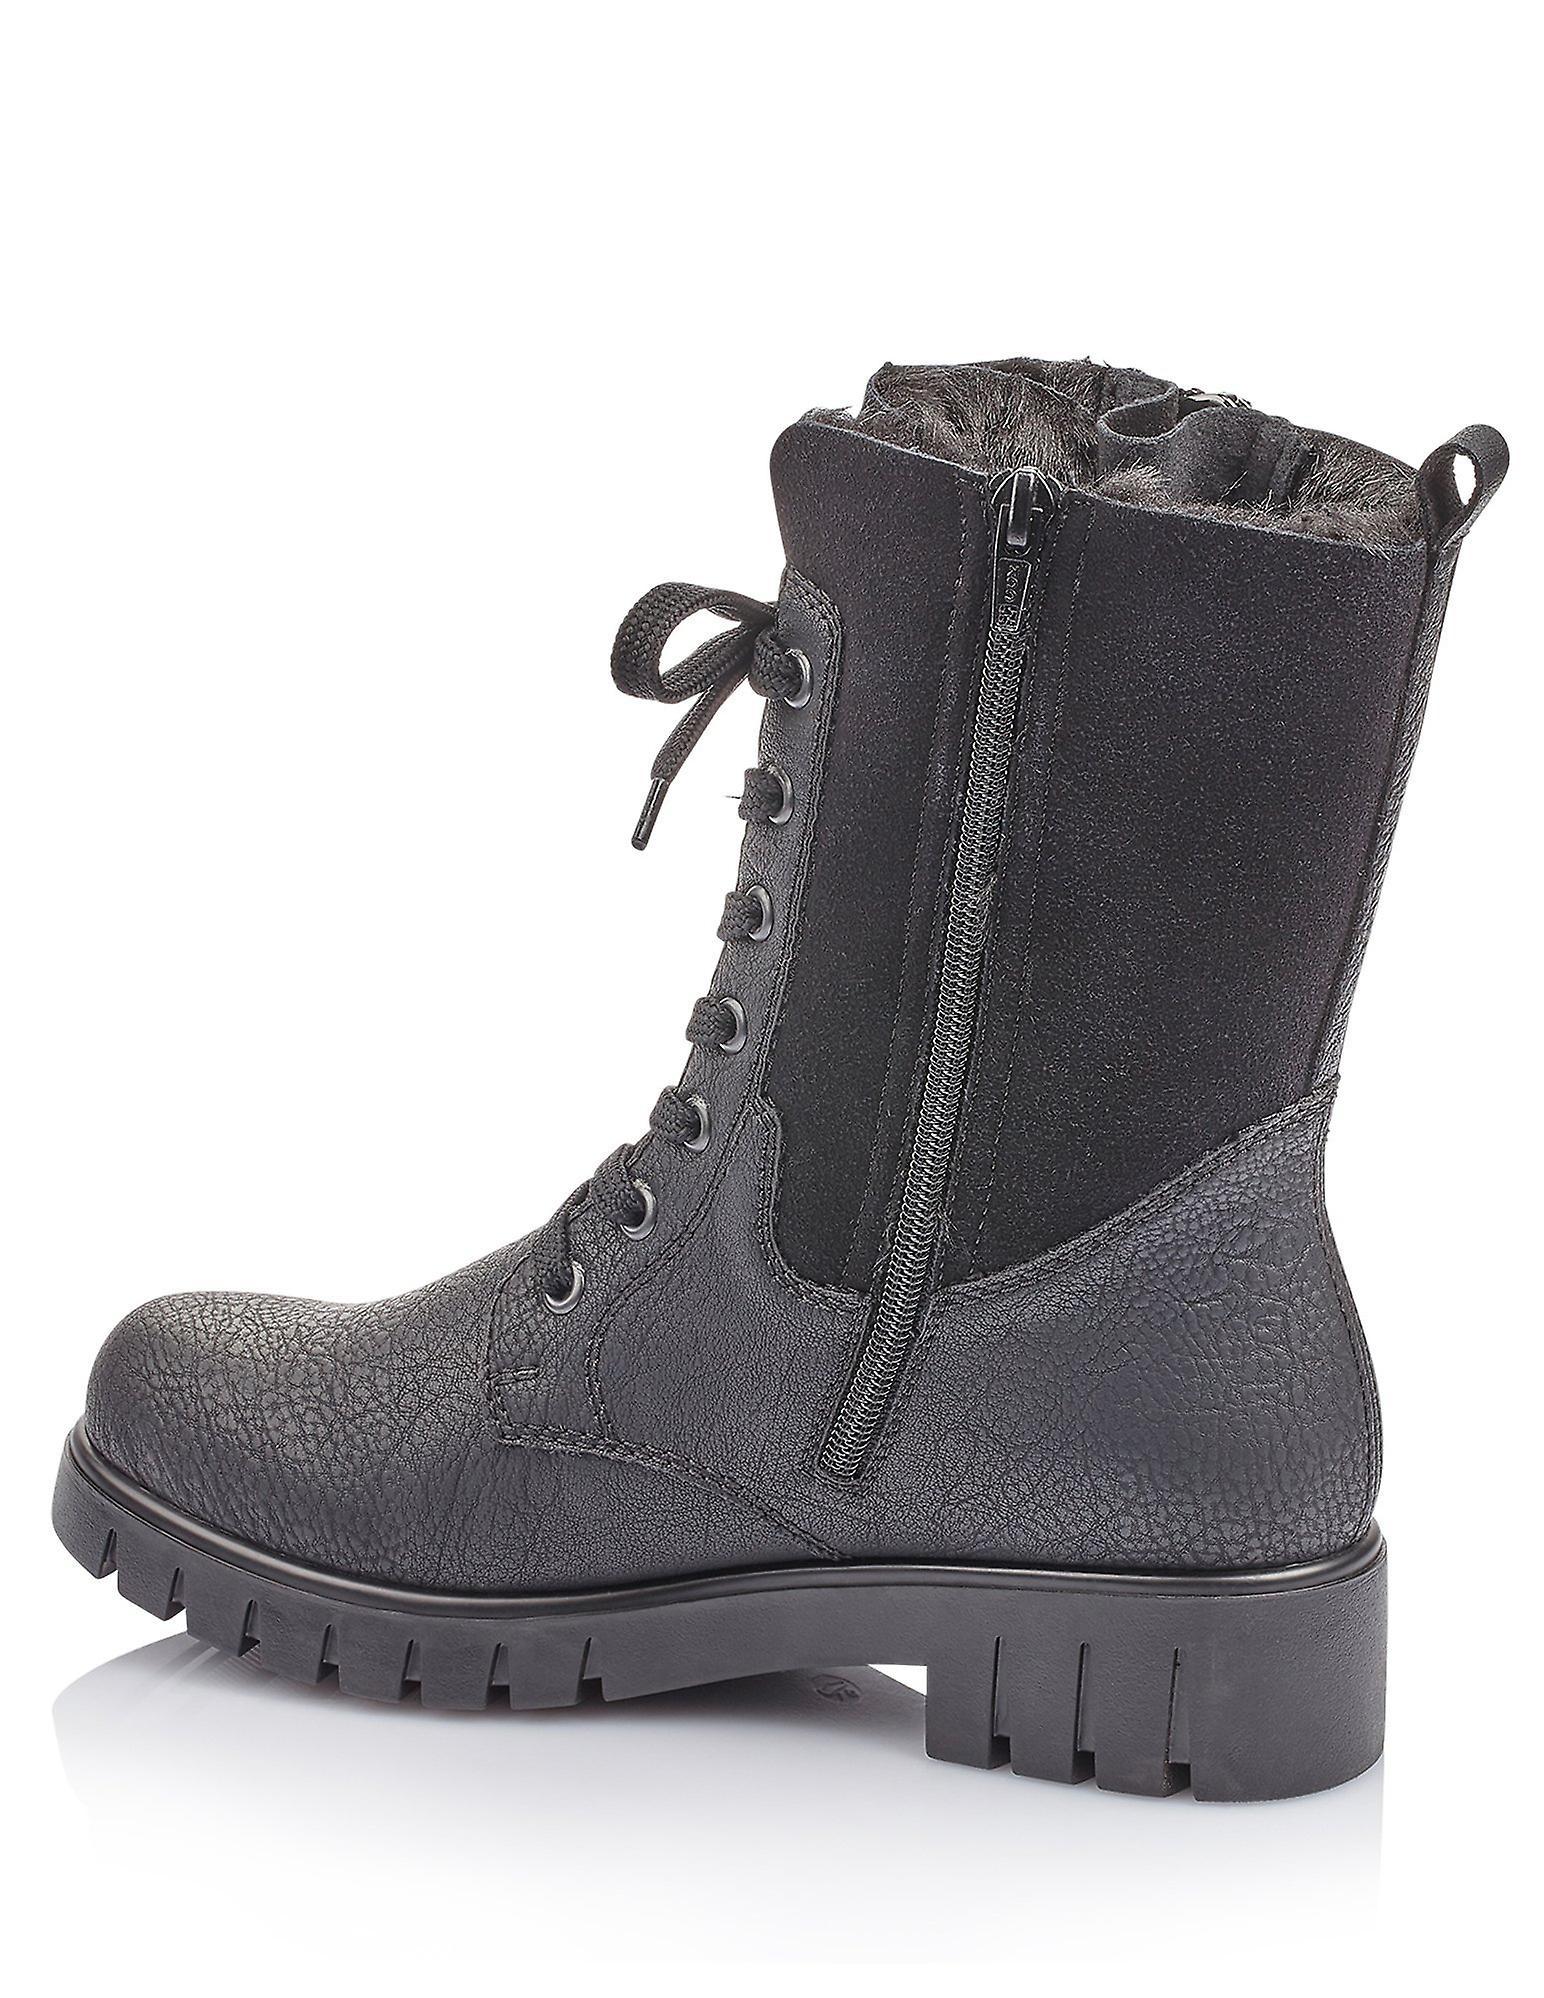 Rieker greece wolfface black boots womens black 002